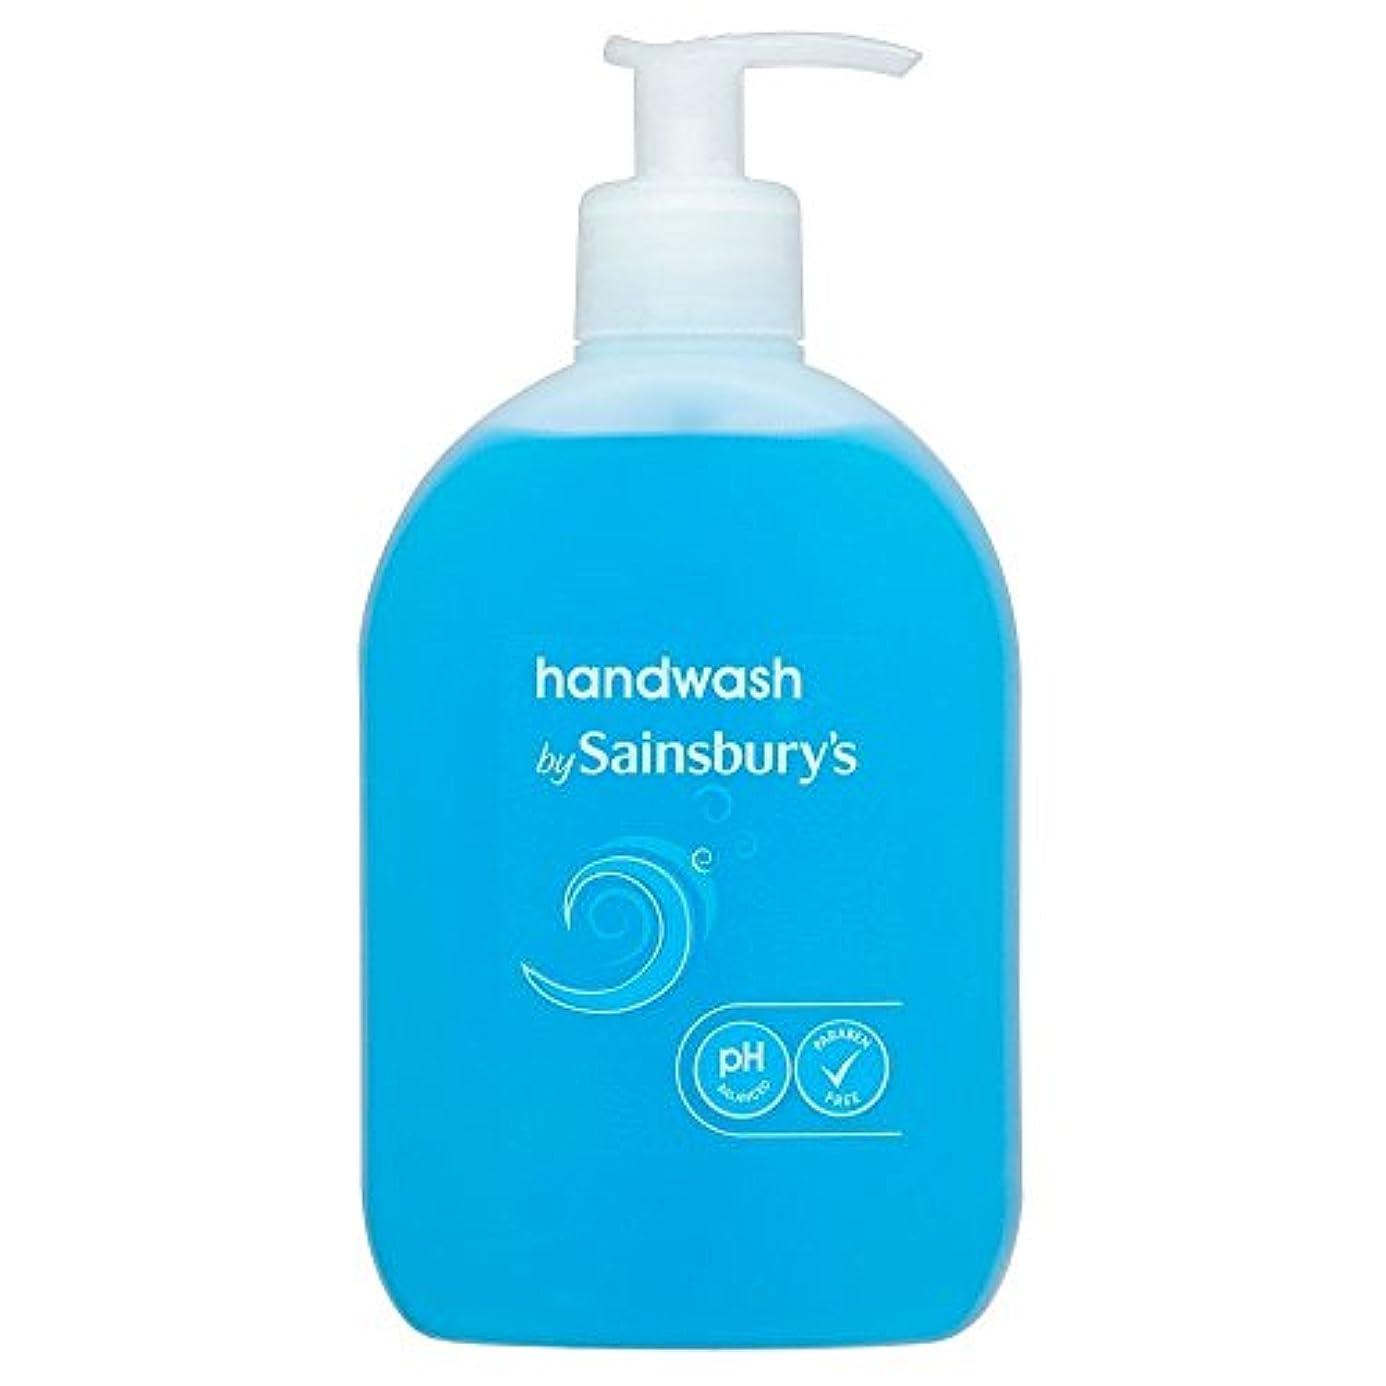 Sainsbury's Handwash, Blue 500ml (Pack of 4) - (Sainsbury's) 手洗い、青500ミリリットル (x4) [並行輸入品]